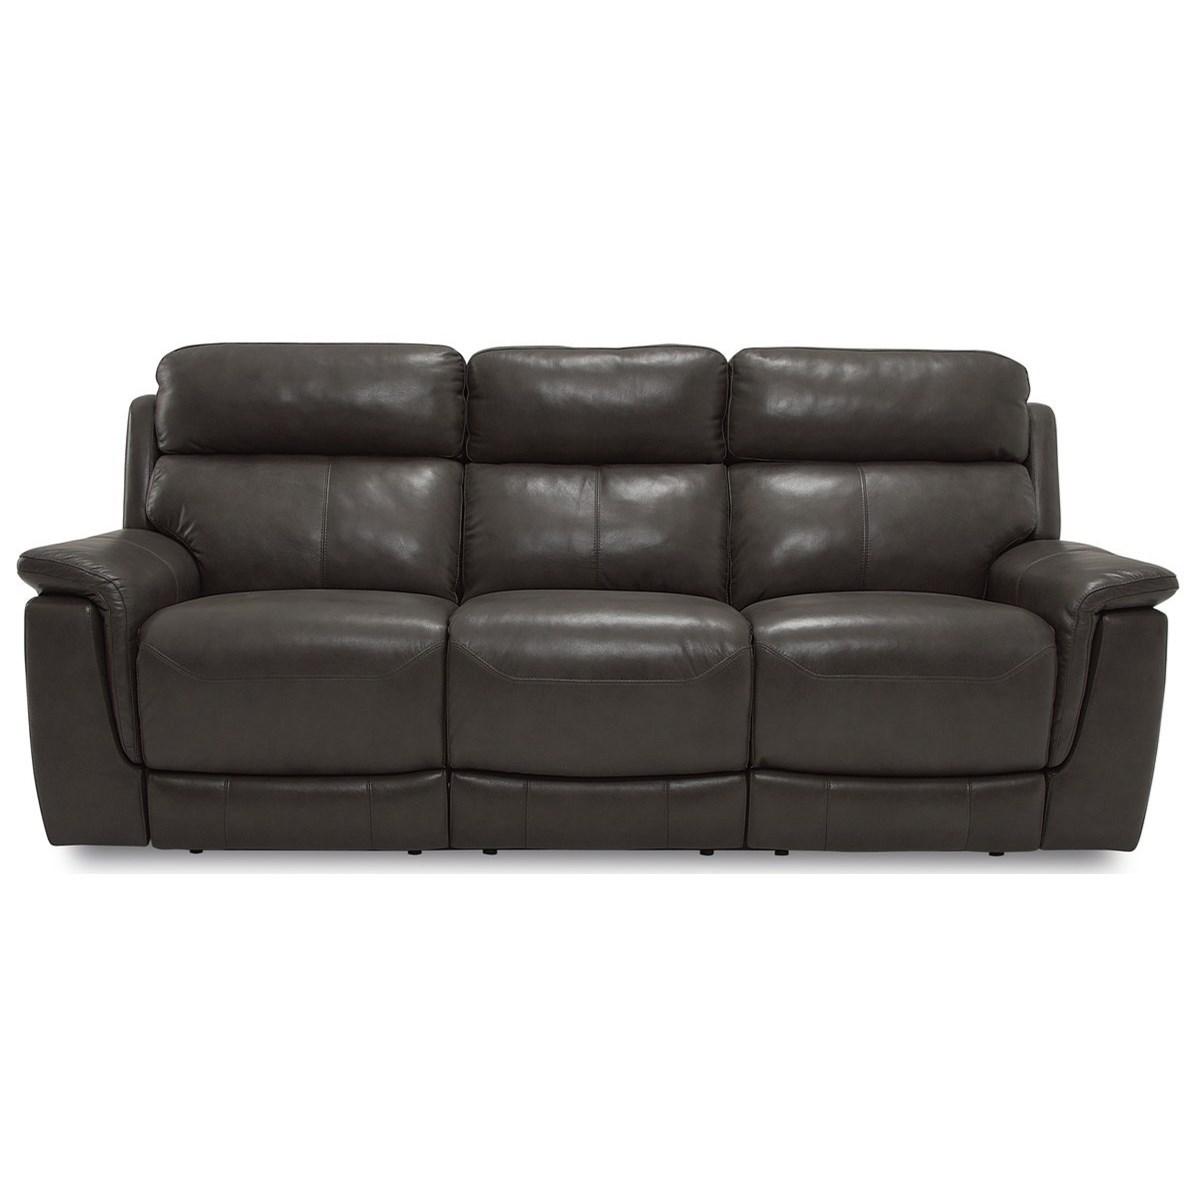 Granada Power Sofa Recliner by Palliser at Darvin Furniture